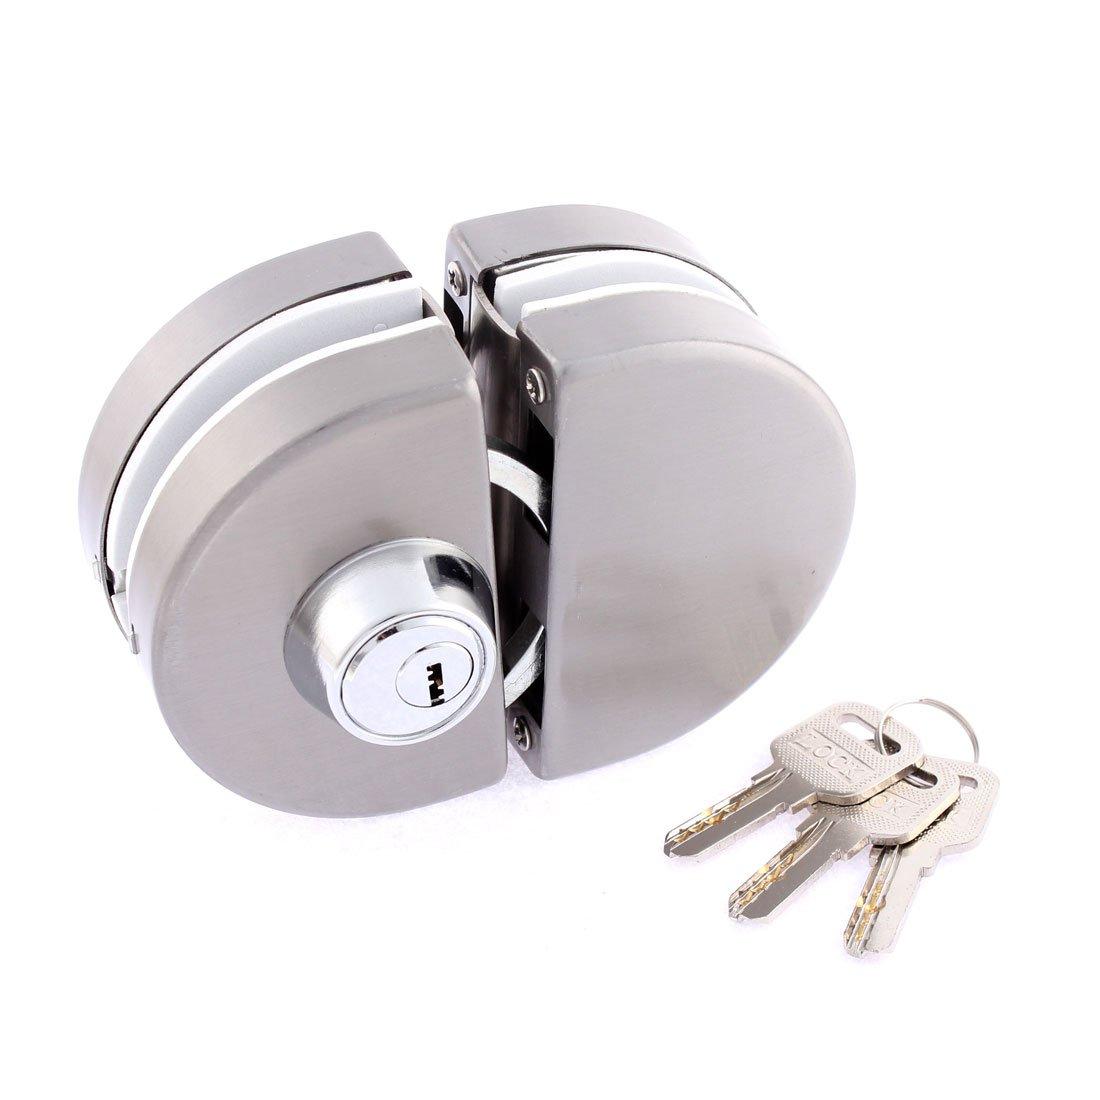 Uxcell SYNCE003733 Entry Gate Swing Push Sliding Glass Door Lock W 3 Keys